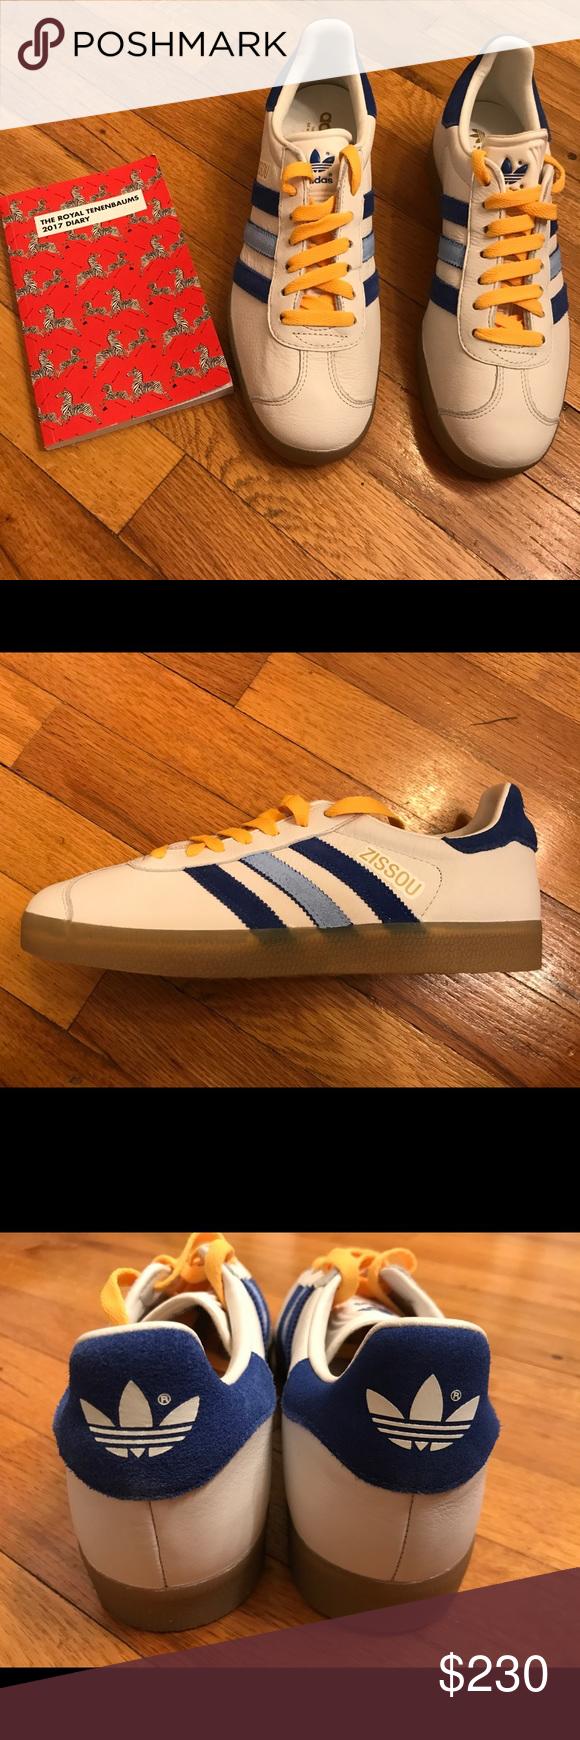 la vita acquatica del team zissou adidas gazzella scarpe nwt adidas